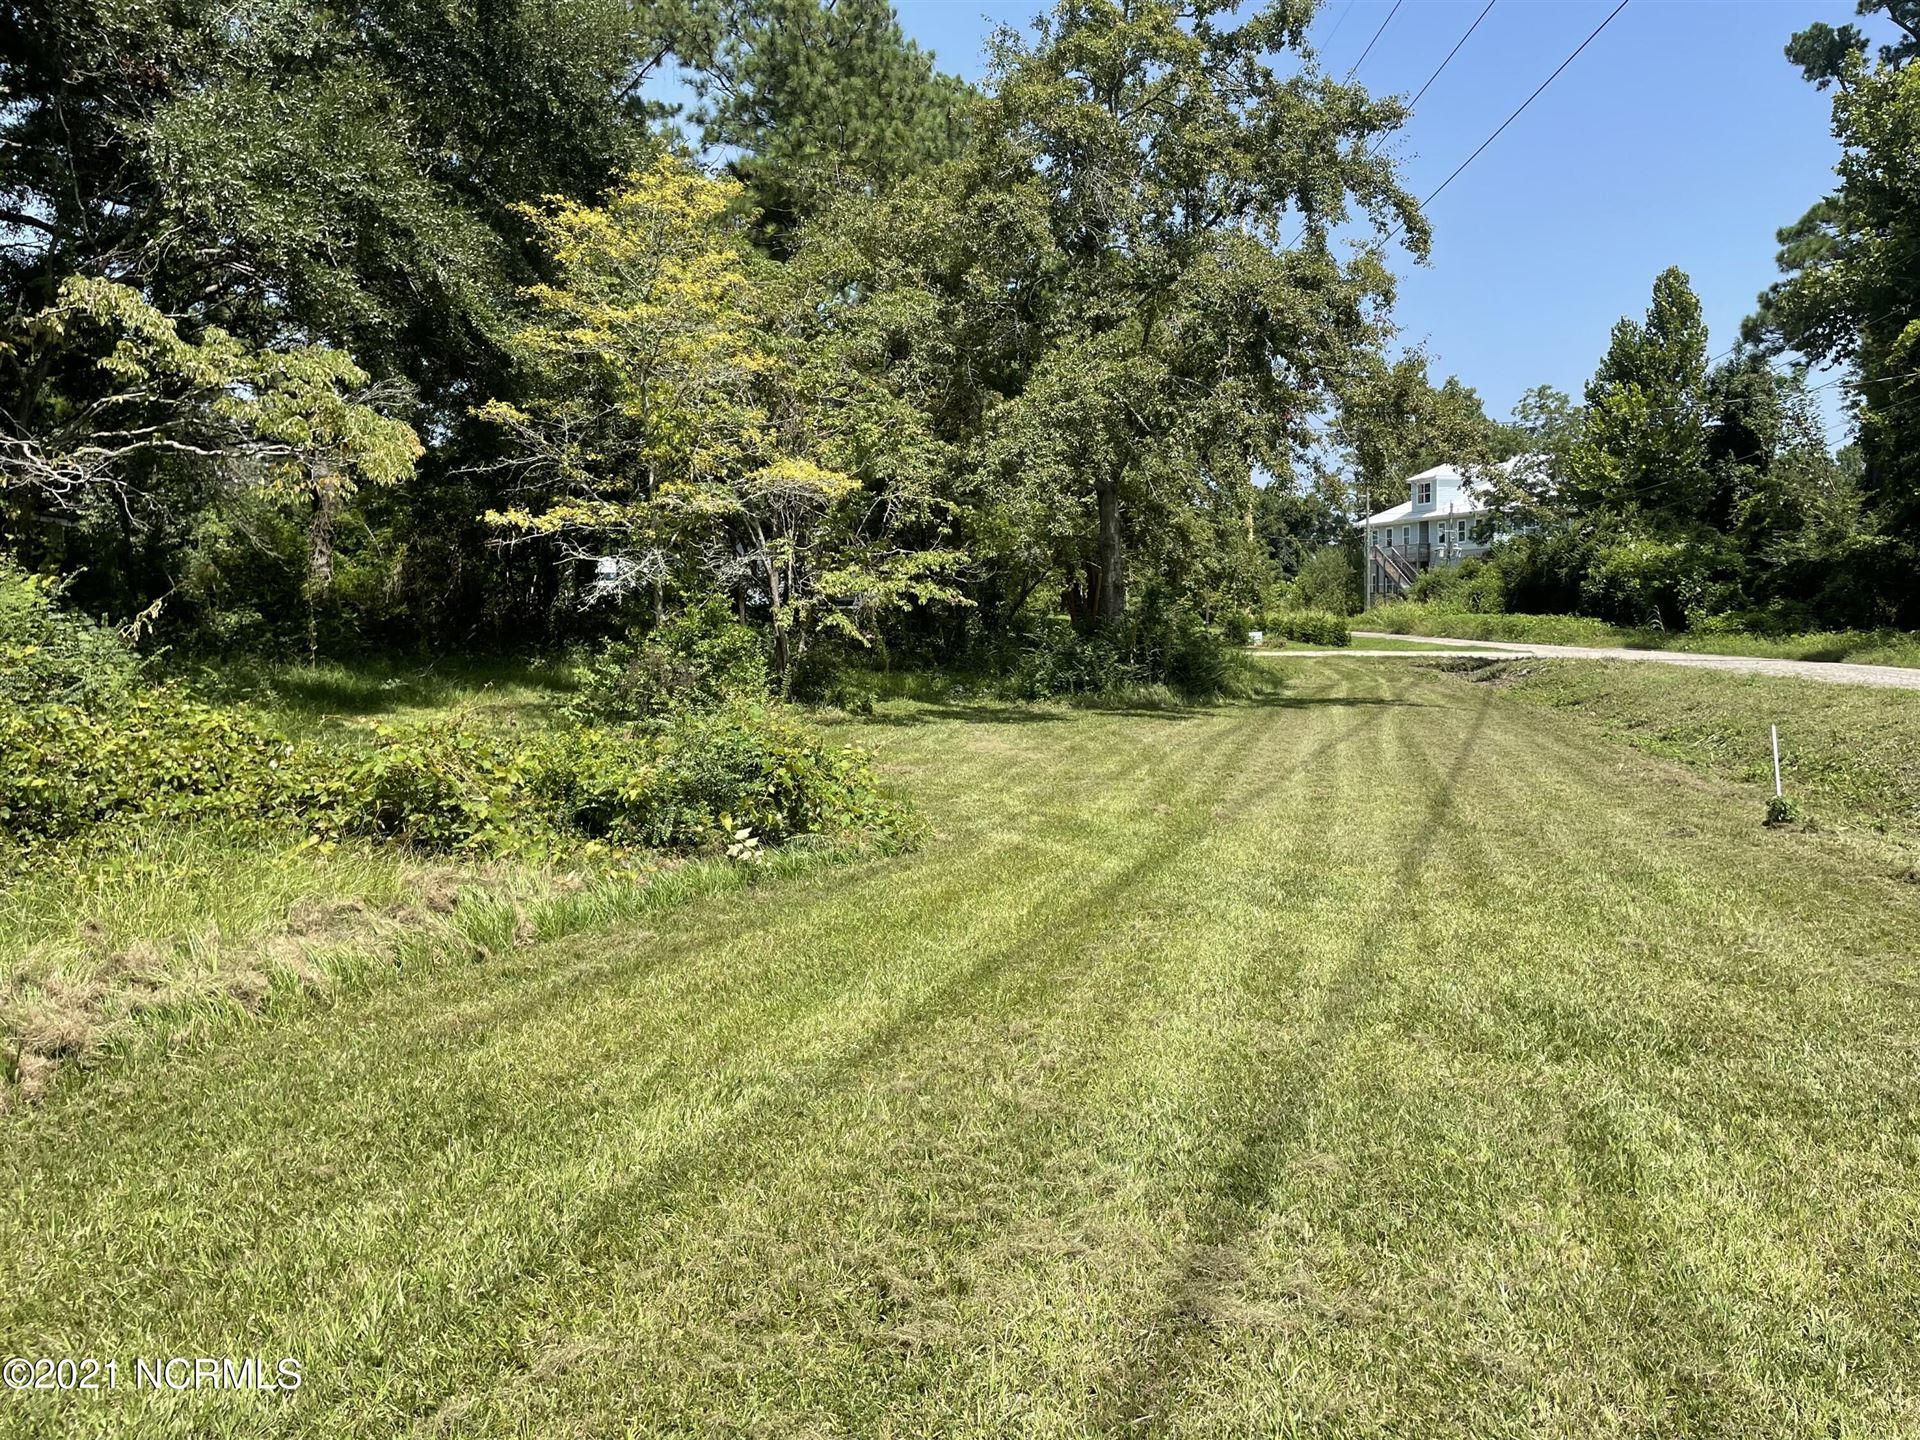 Photo of 0 Pecan Avenue, Wilmington, NC 28403 (MLS # 100288504)